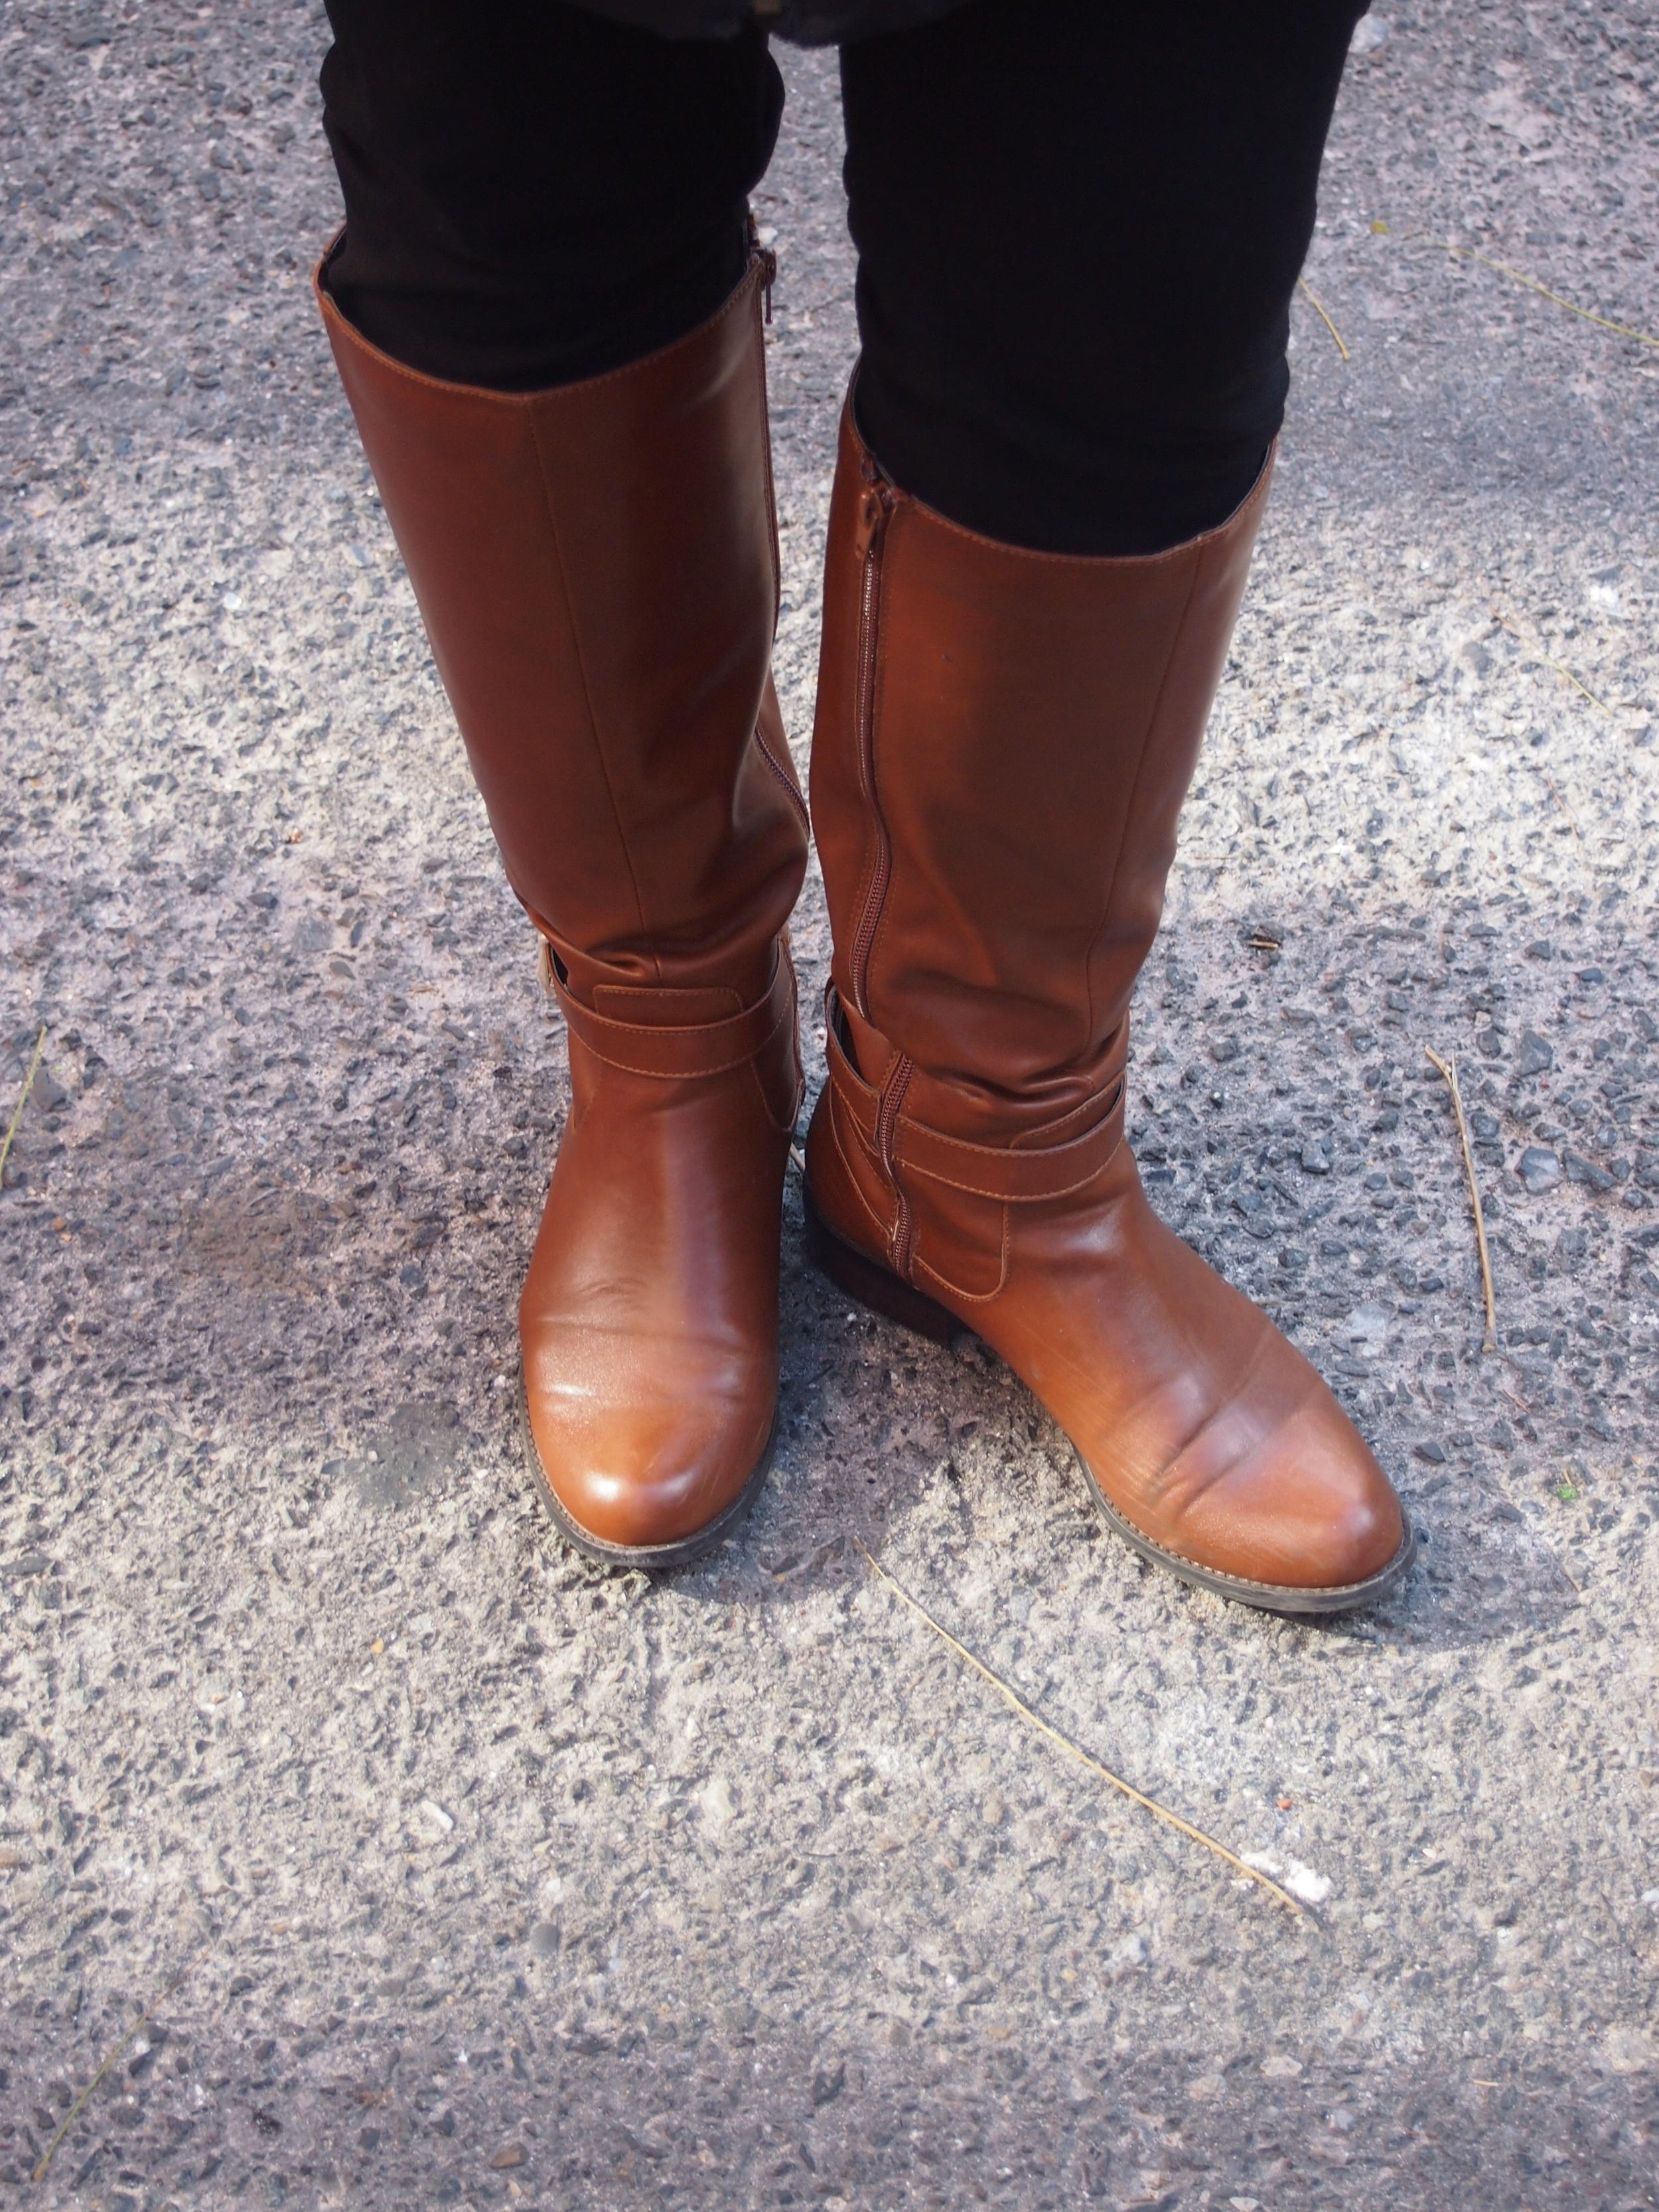 Fall-Brown-Boots.JPG